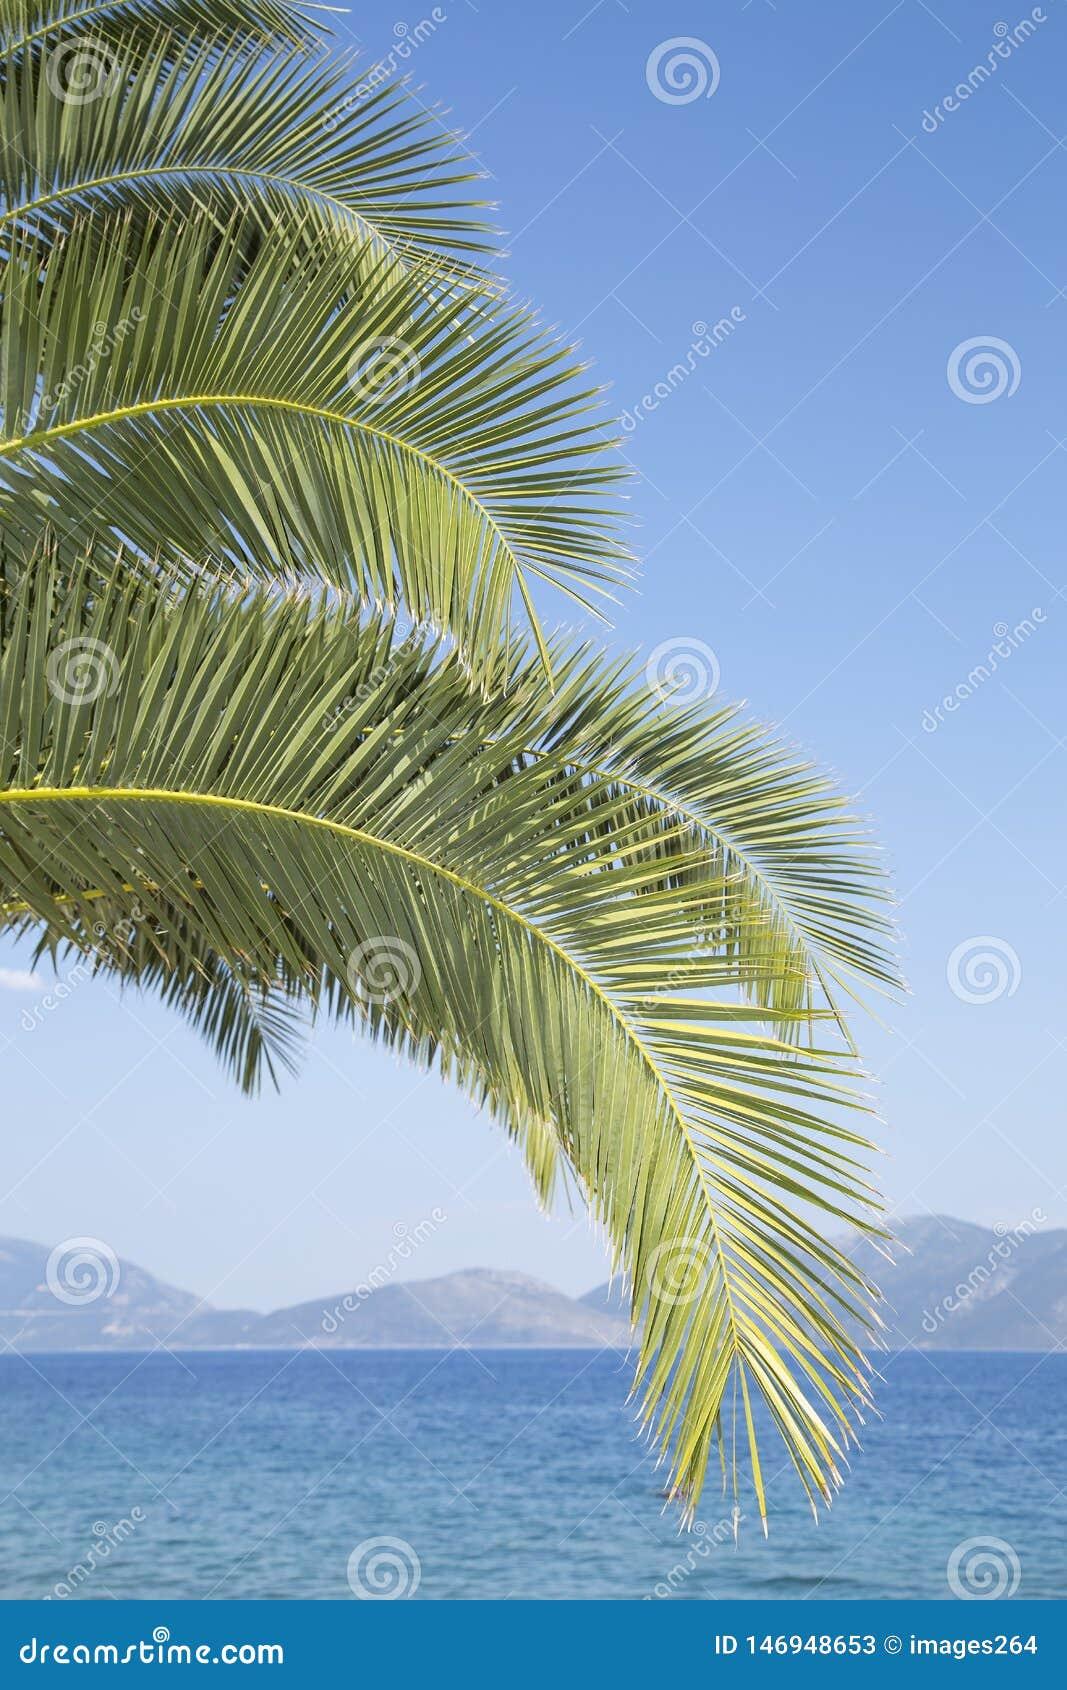 Fotographie eingelassene Mittelmeerinsel Korsika